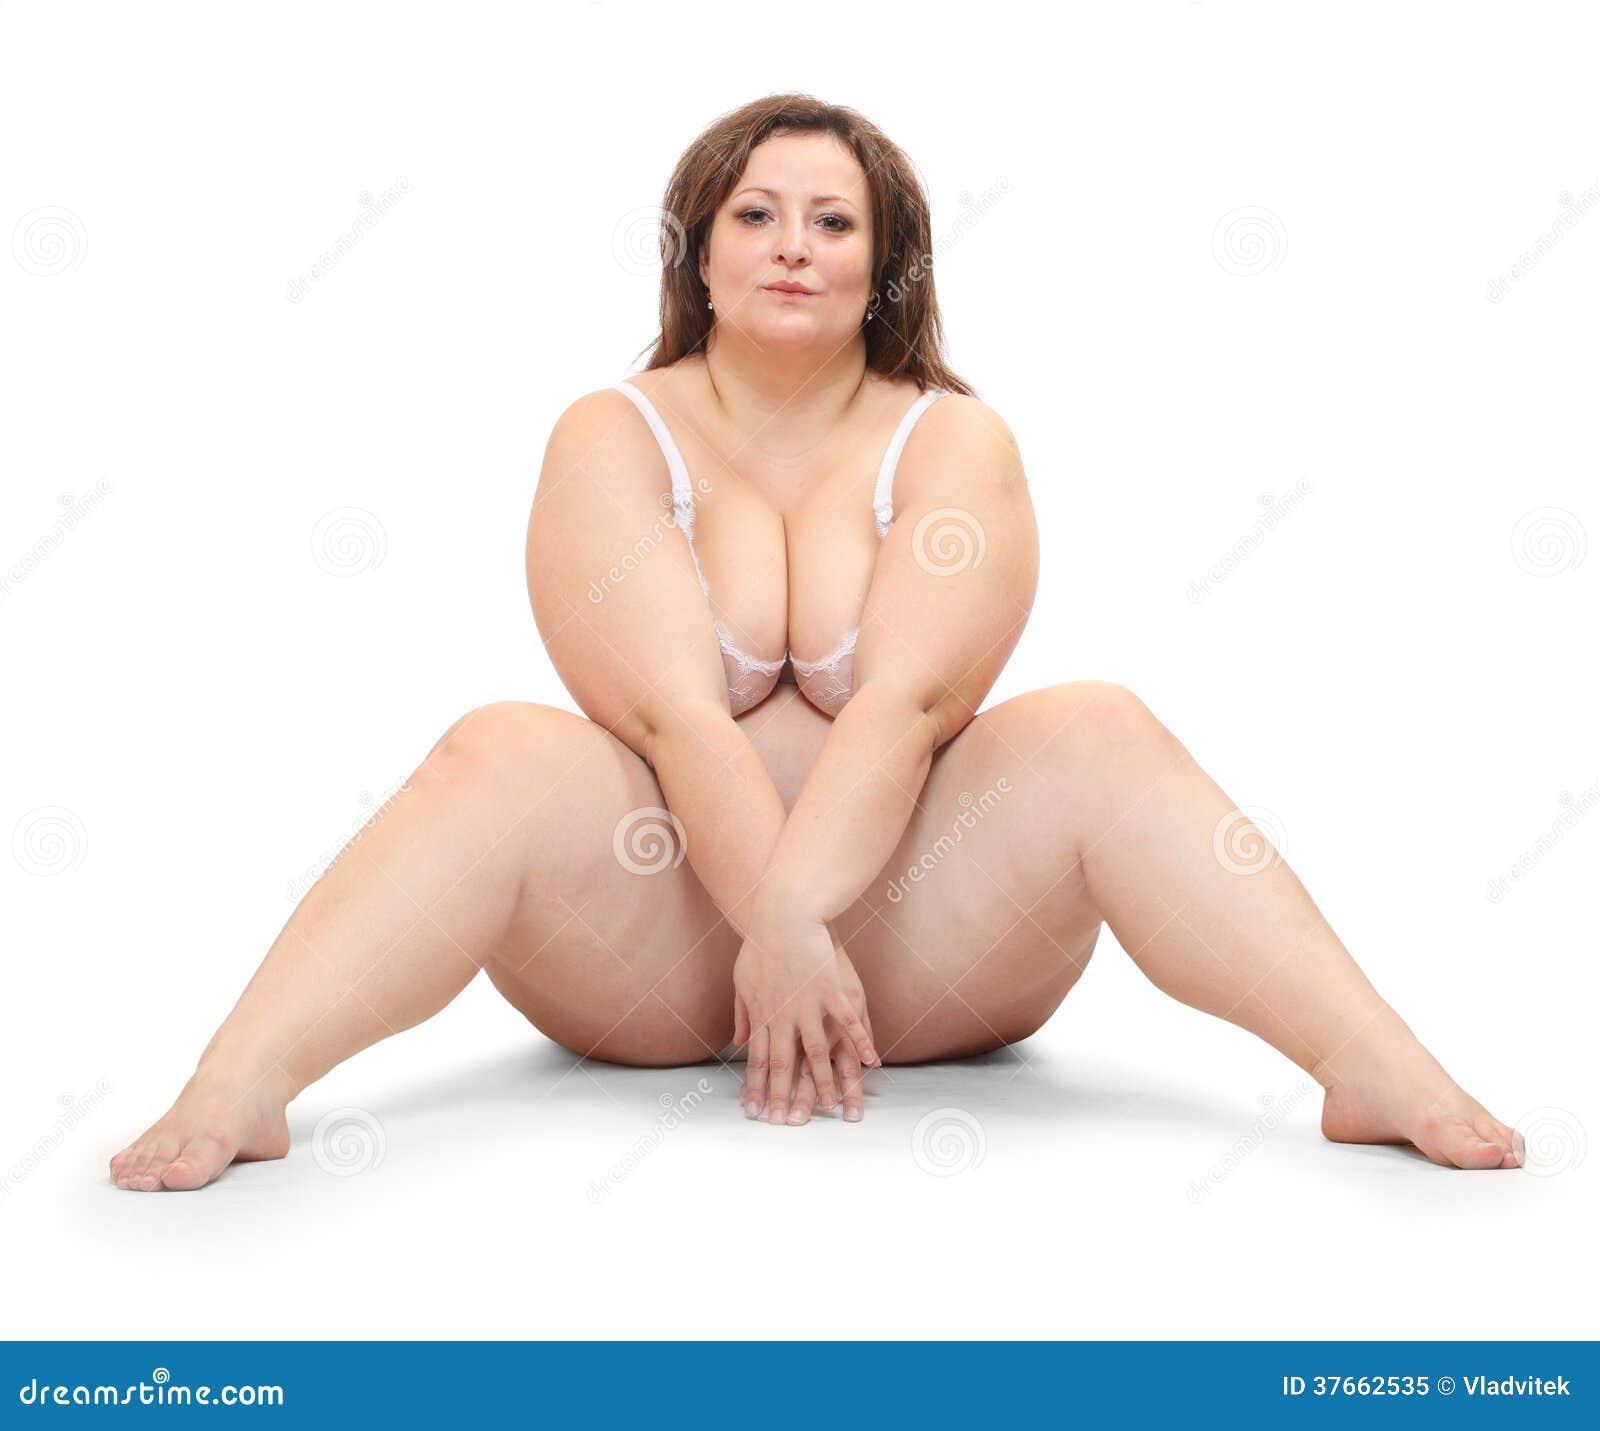 Fotos de bikini de chica gorda